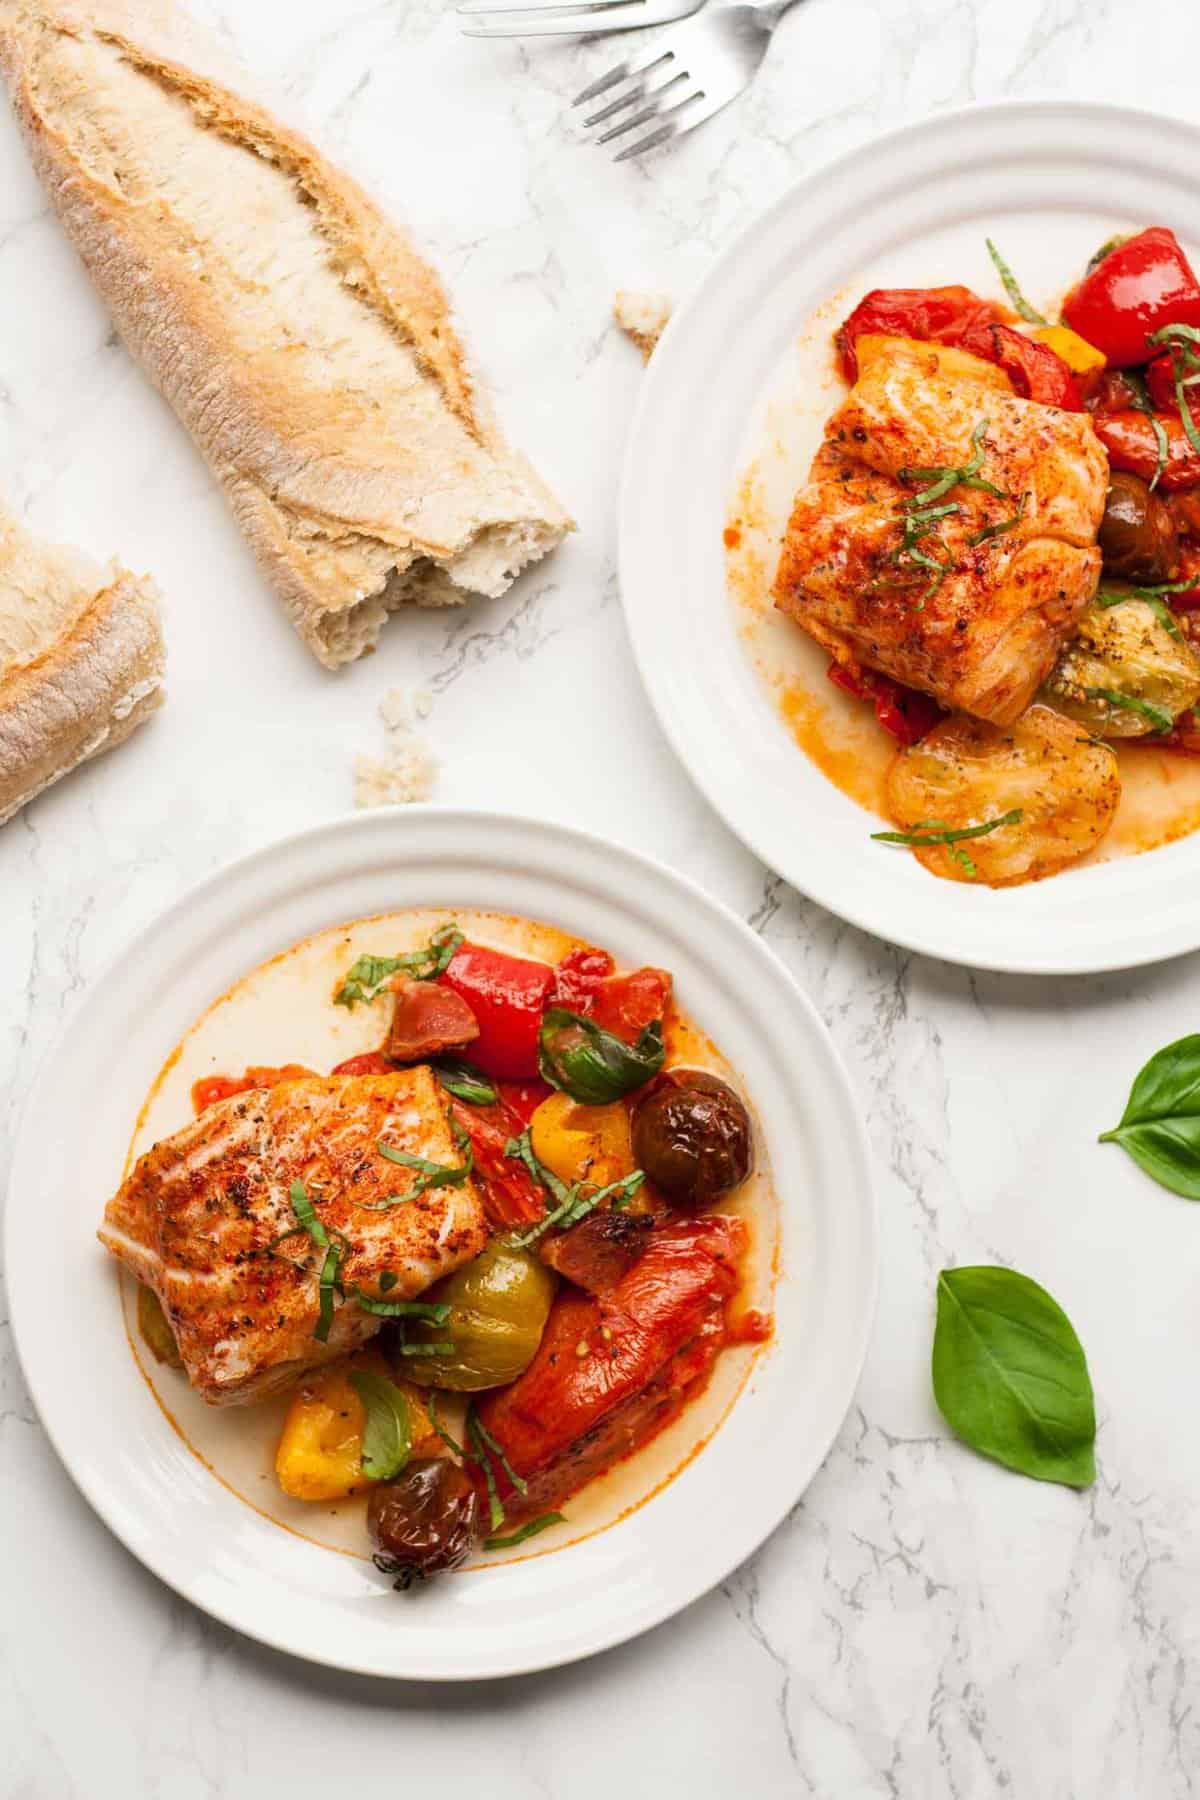 Roasted Heirloom Tomatoes with Cod and Chorizo - this simple summer traybake is full of seasonal produce and tastes amazing!   eatloveeats.com